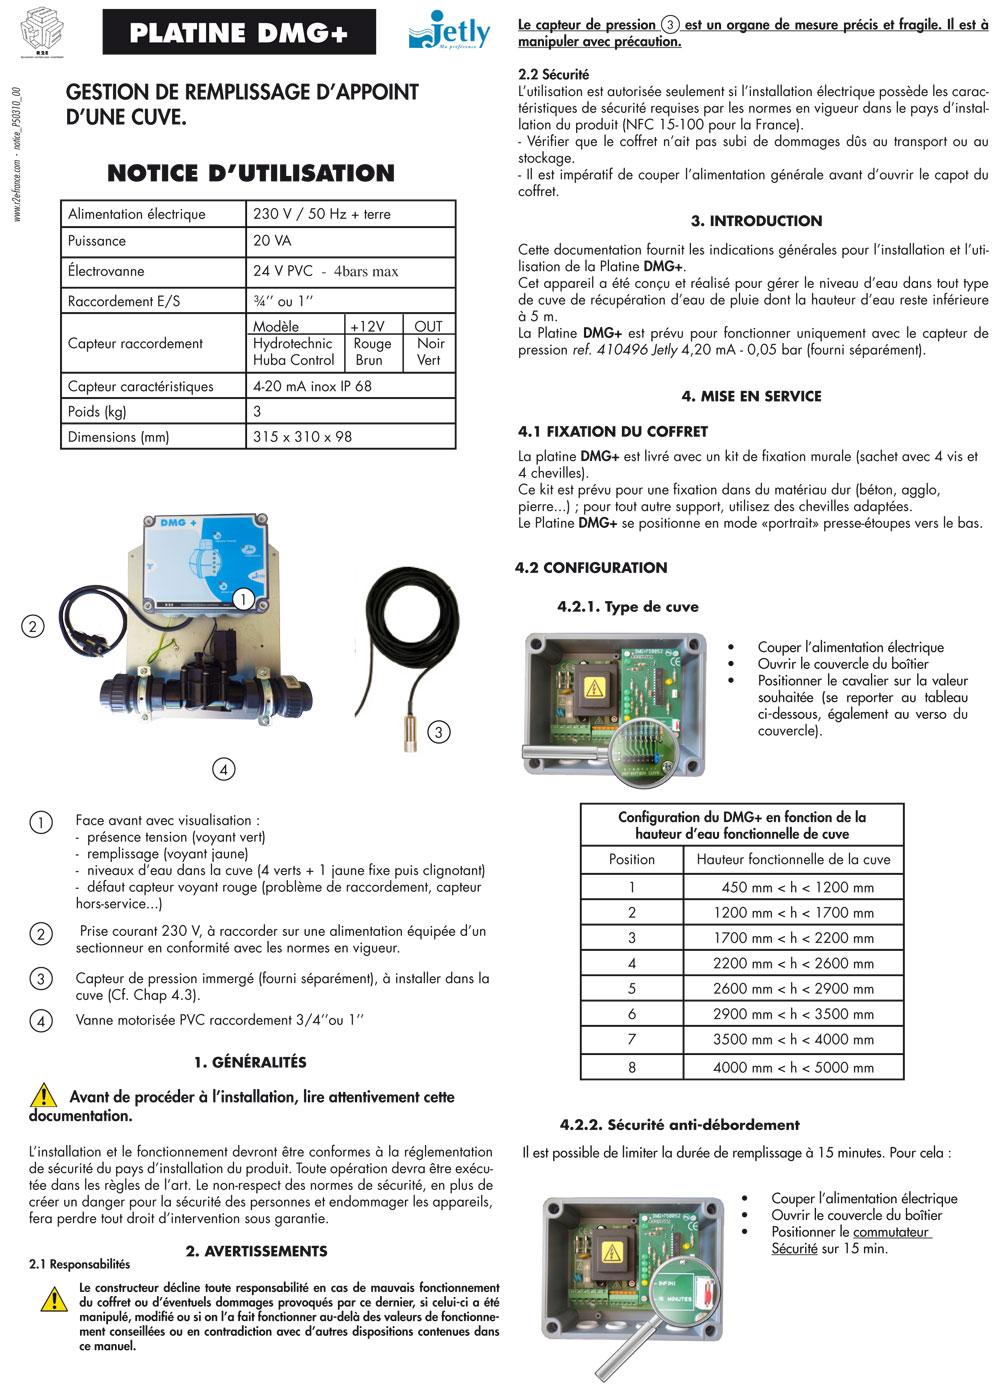 Notice DMG+, coffret de pompe hydraulique